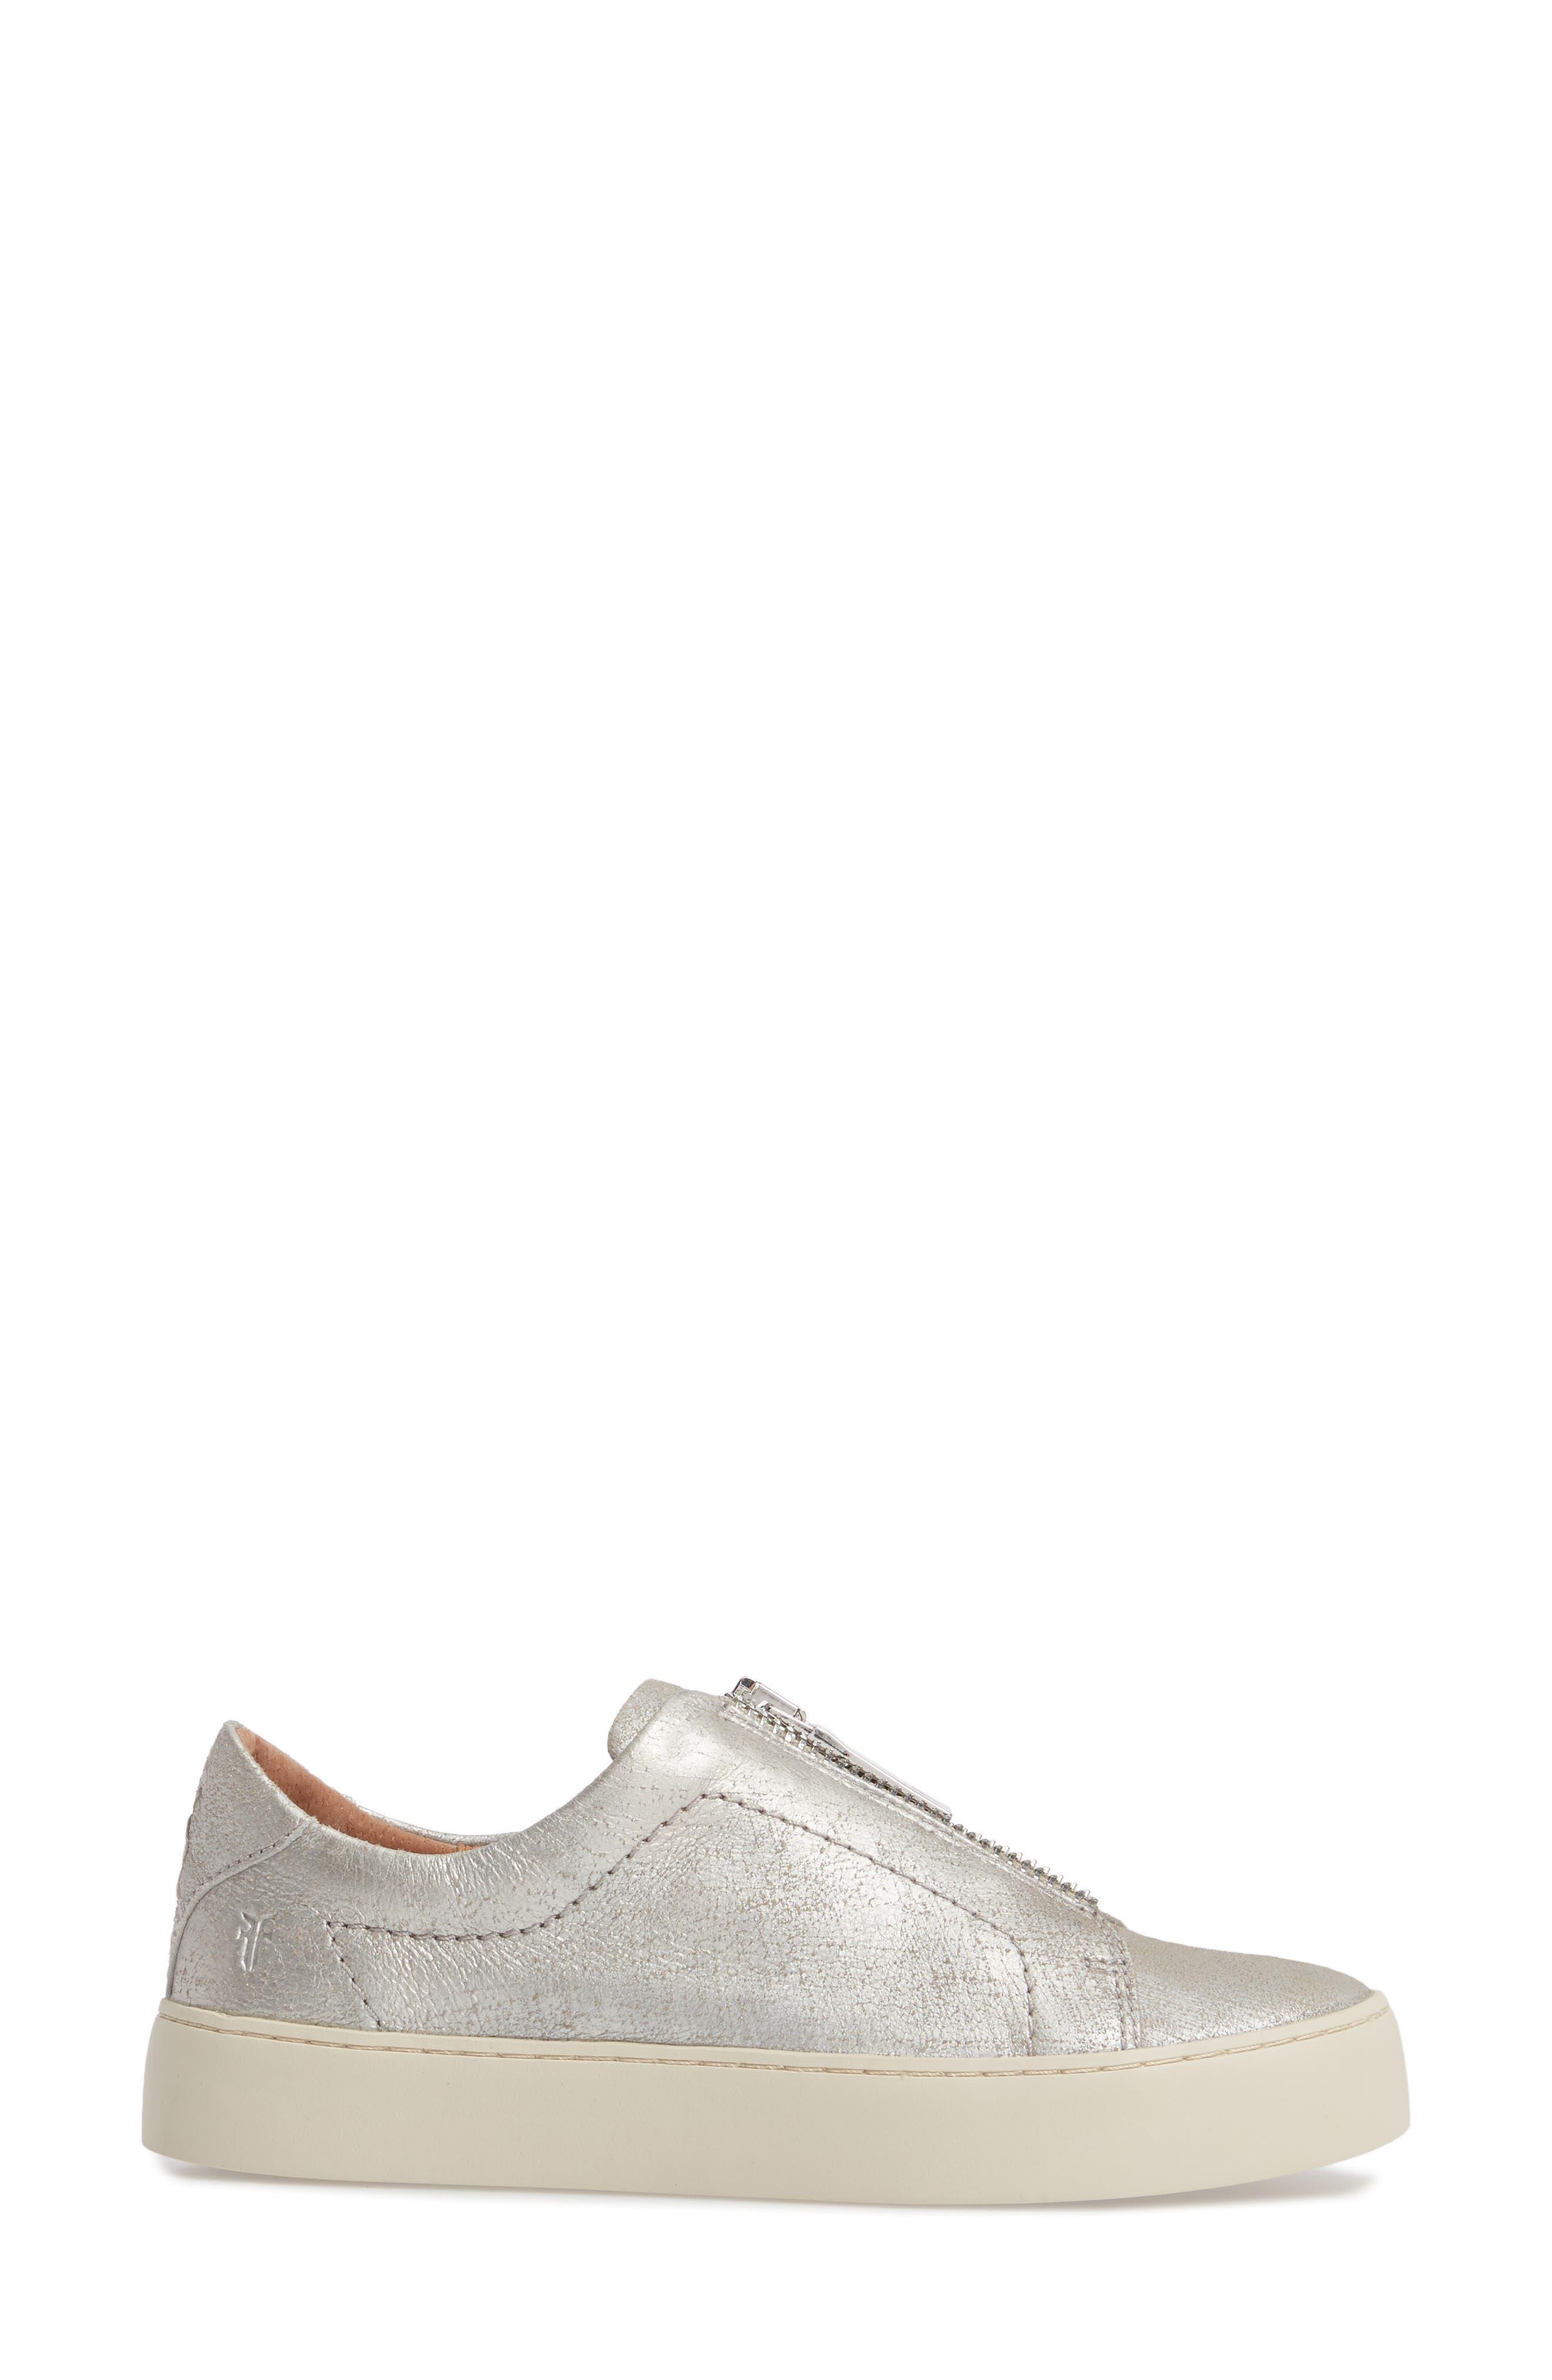 Lena Zip Sneaker,                             Alternate thumbnail 3, color,                             Silver Leather